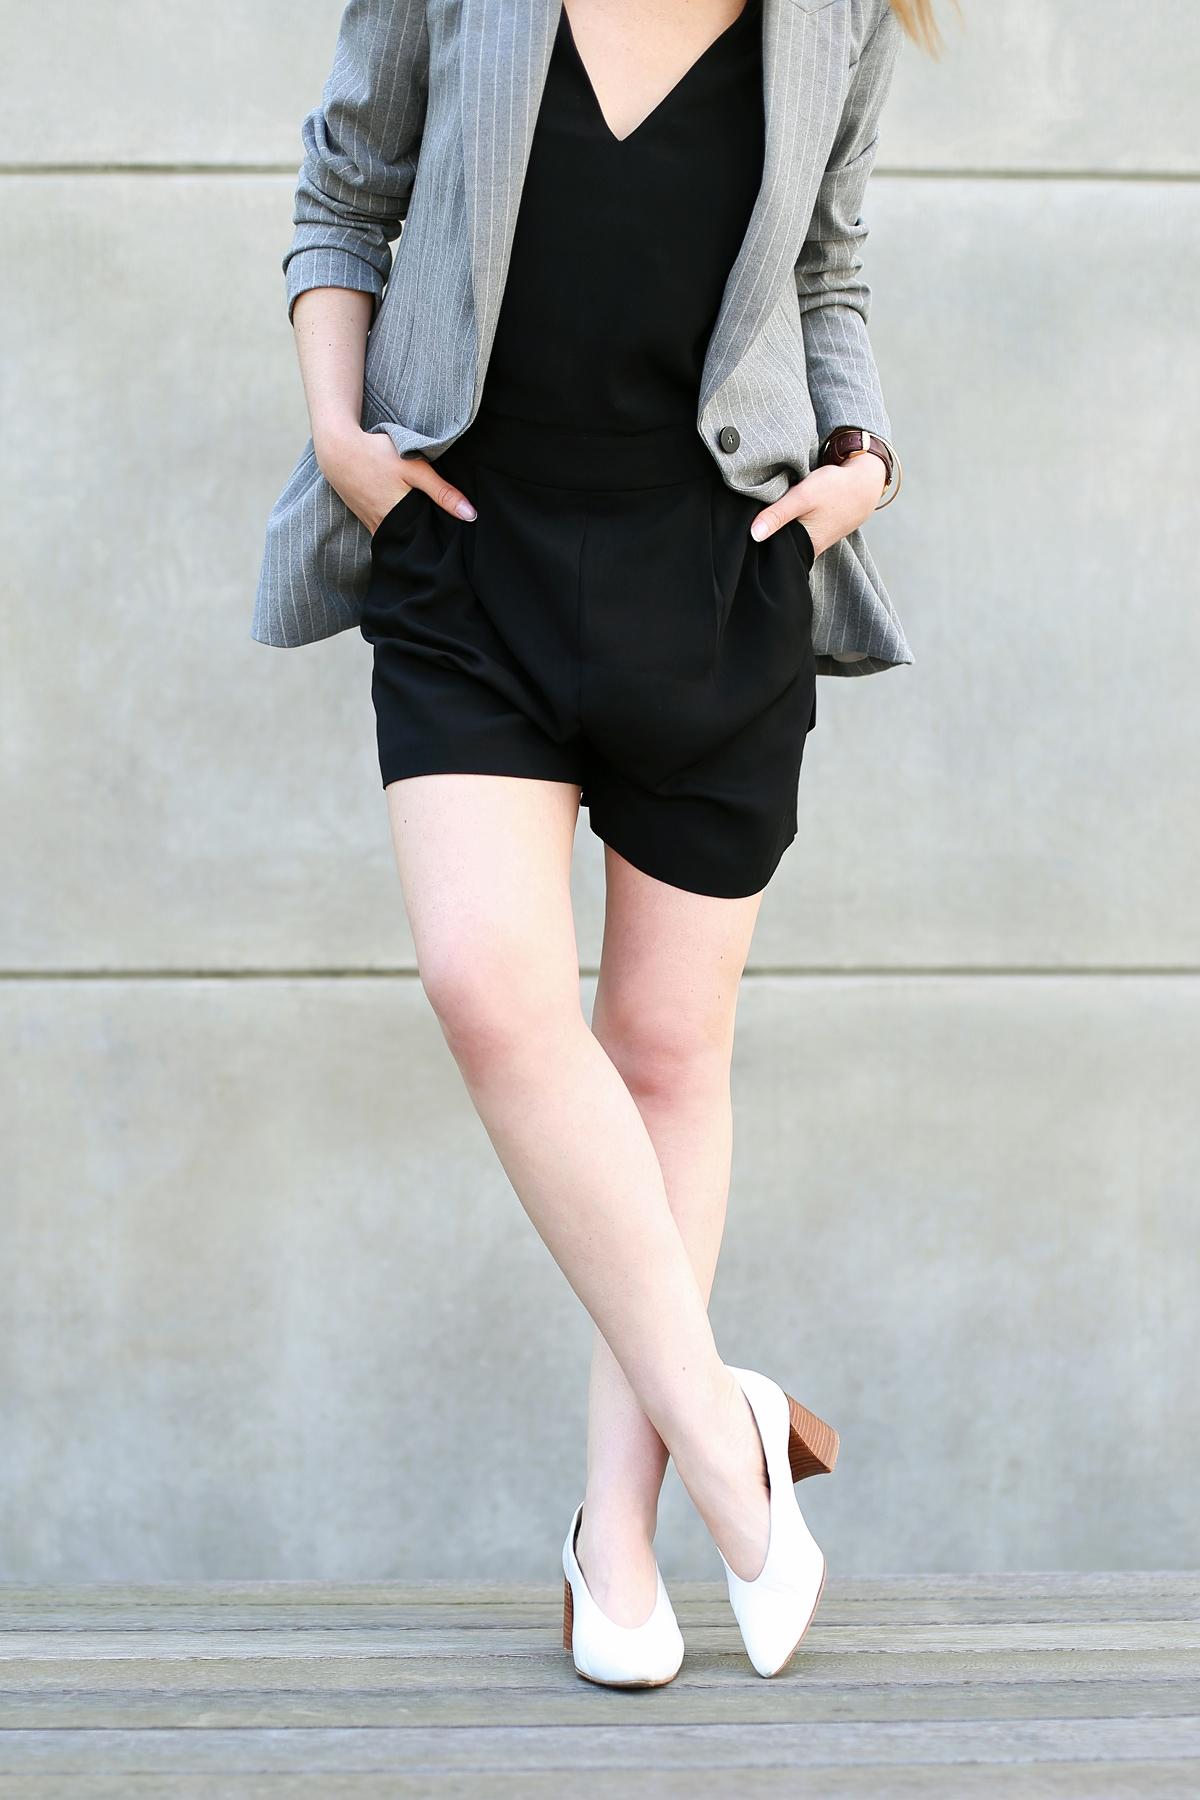 Kombinezon - blog modowy - minimalizm